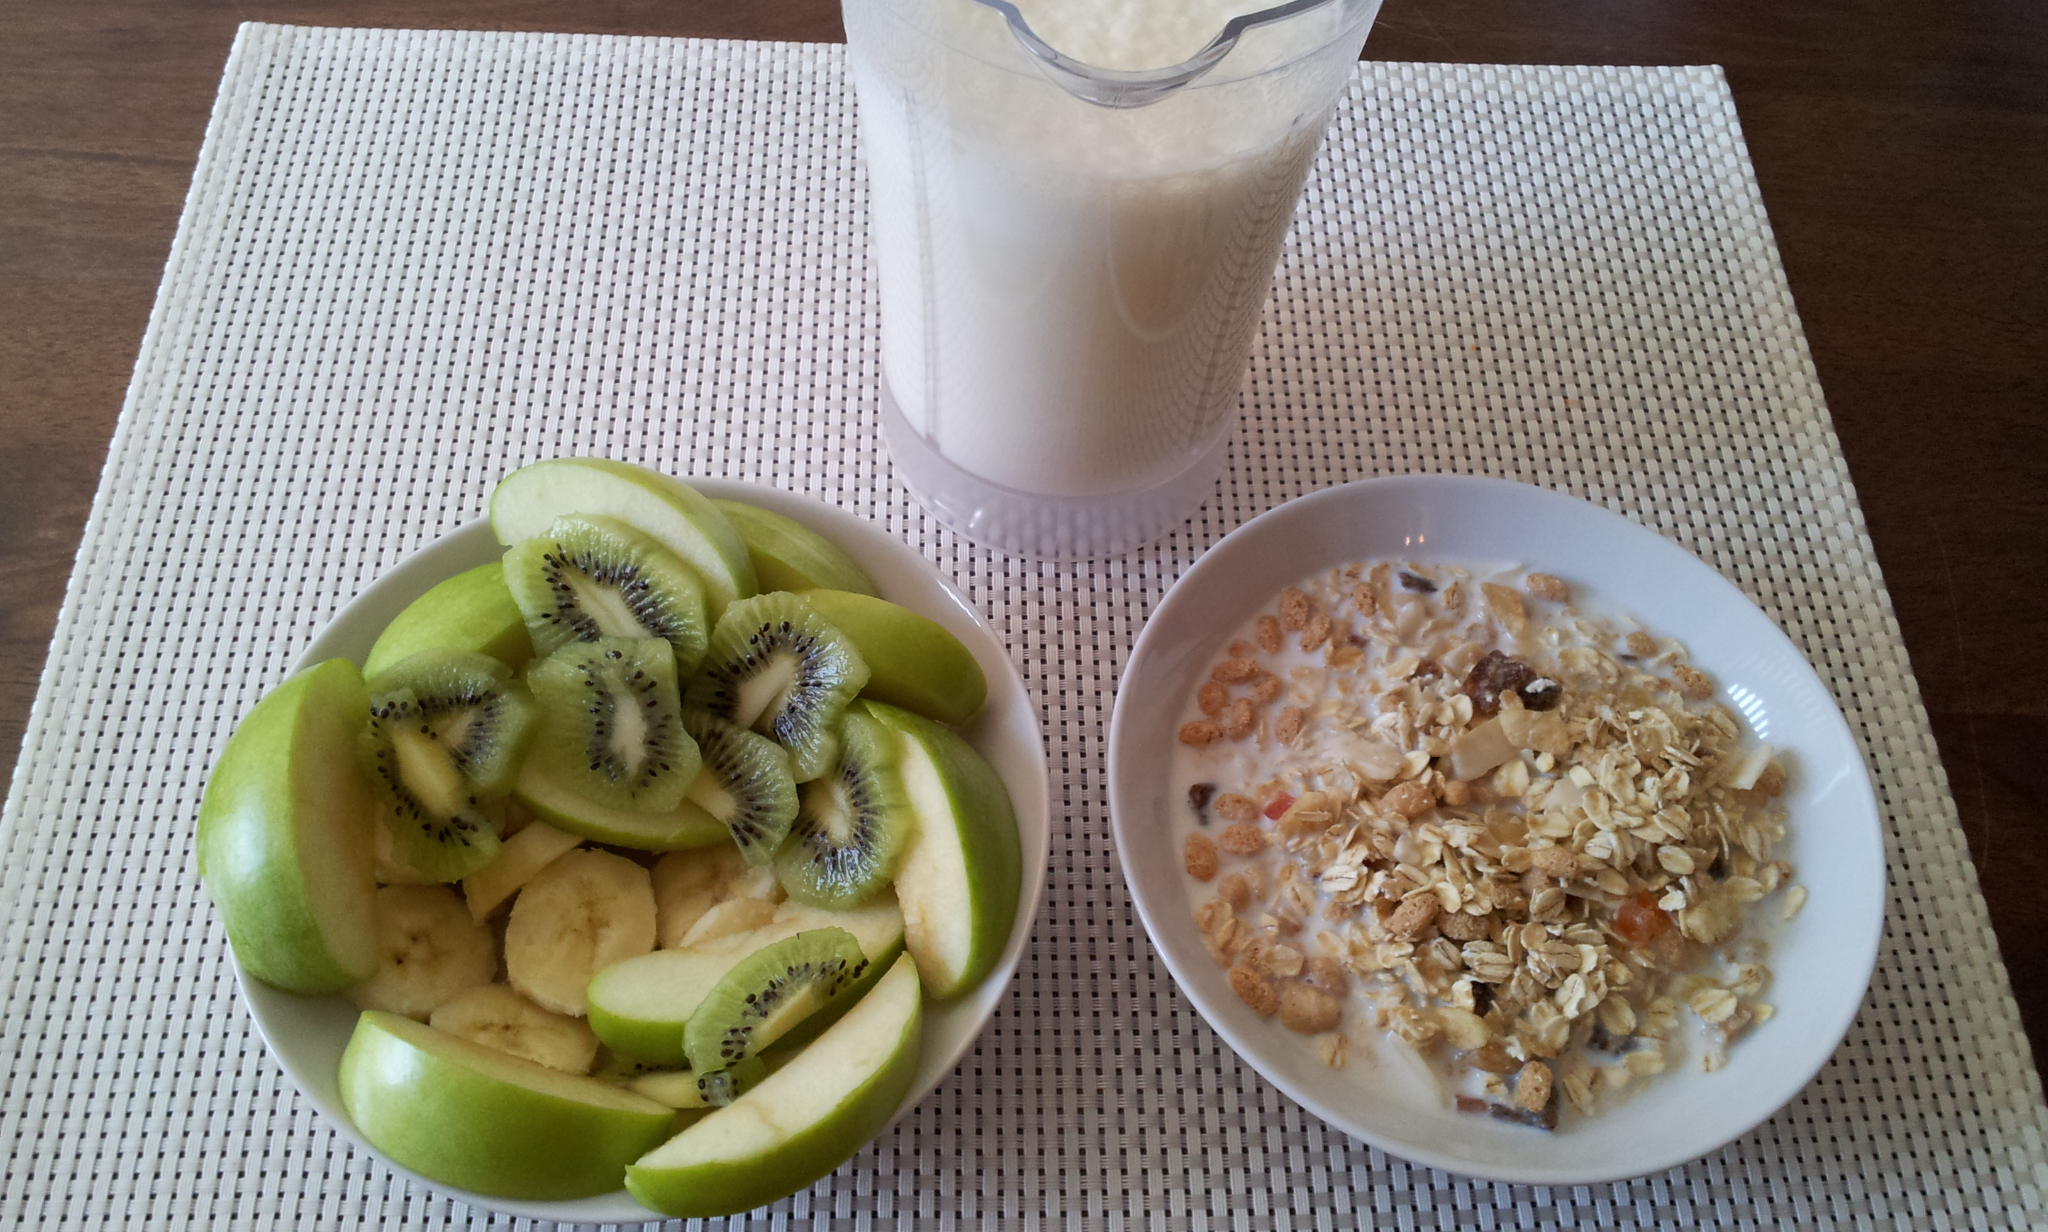 https://foodloader.net/Holz_2013-07-22_Bananenshake_mit_Muesli_und_Obstsalat.jpg